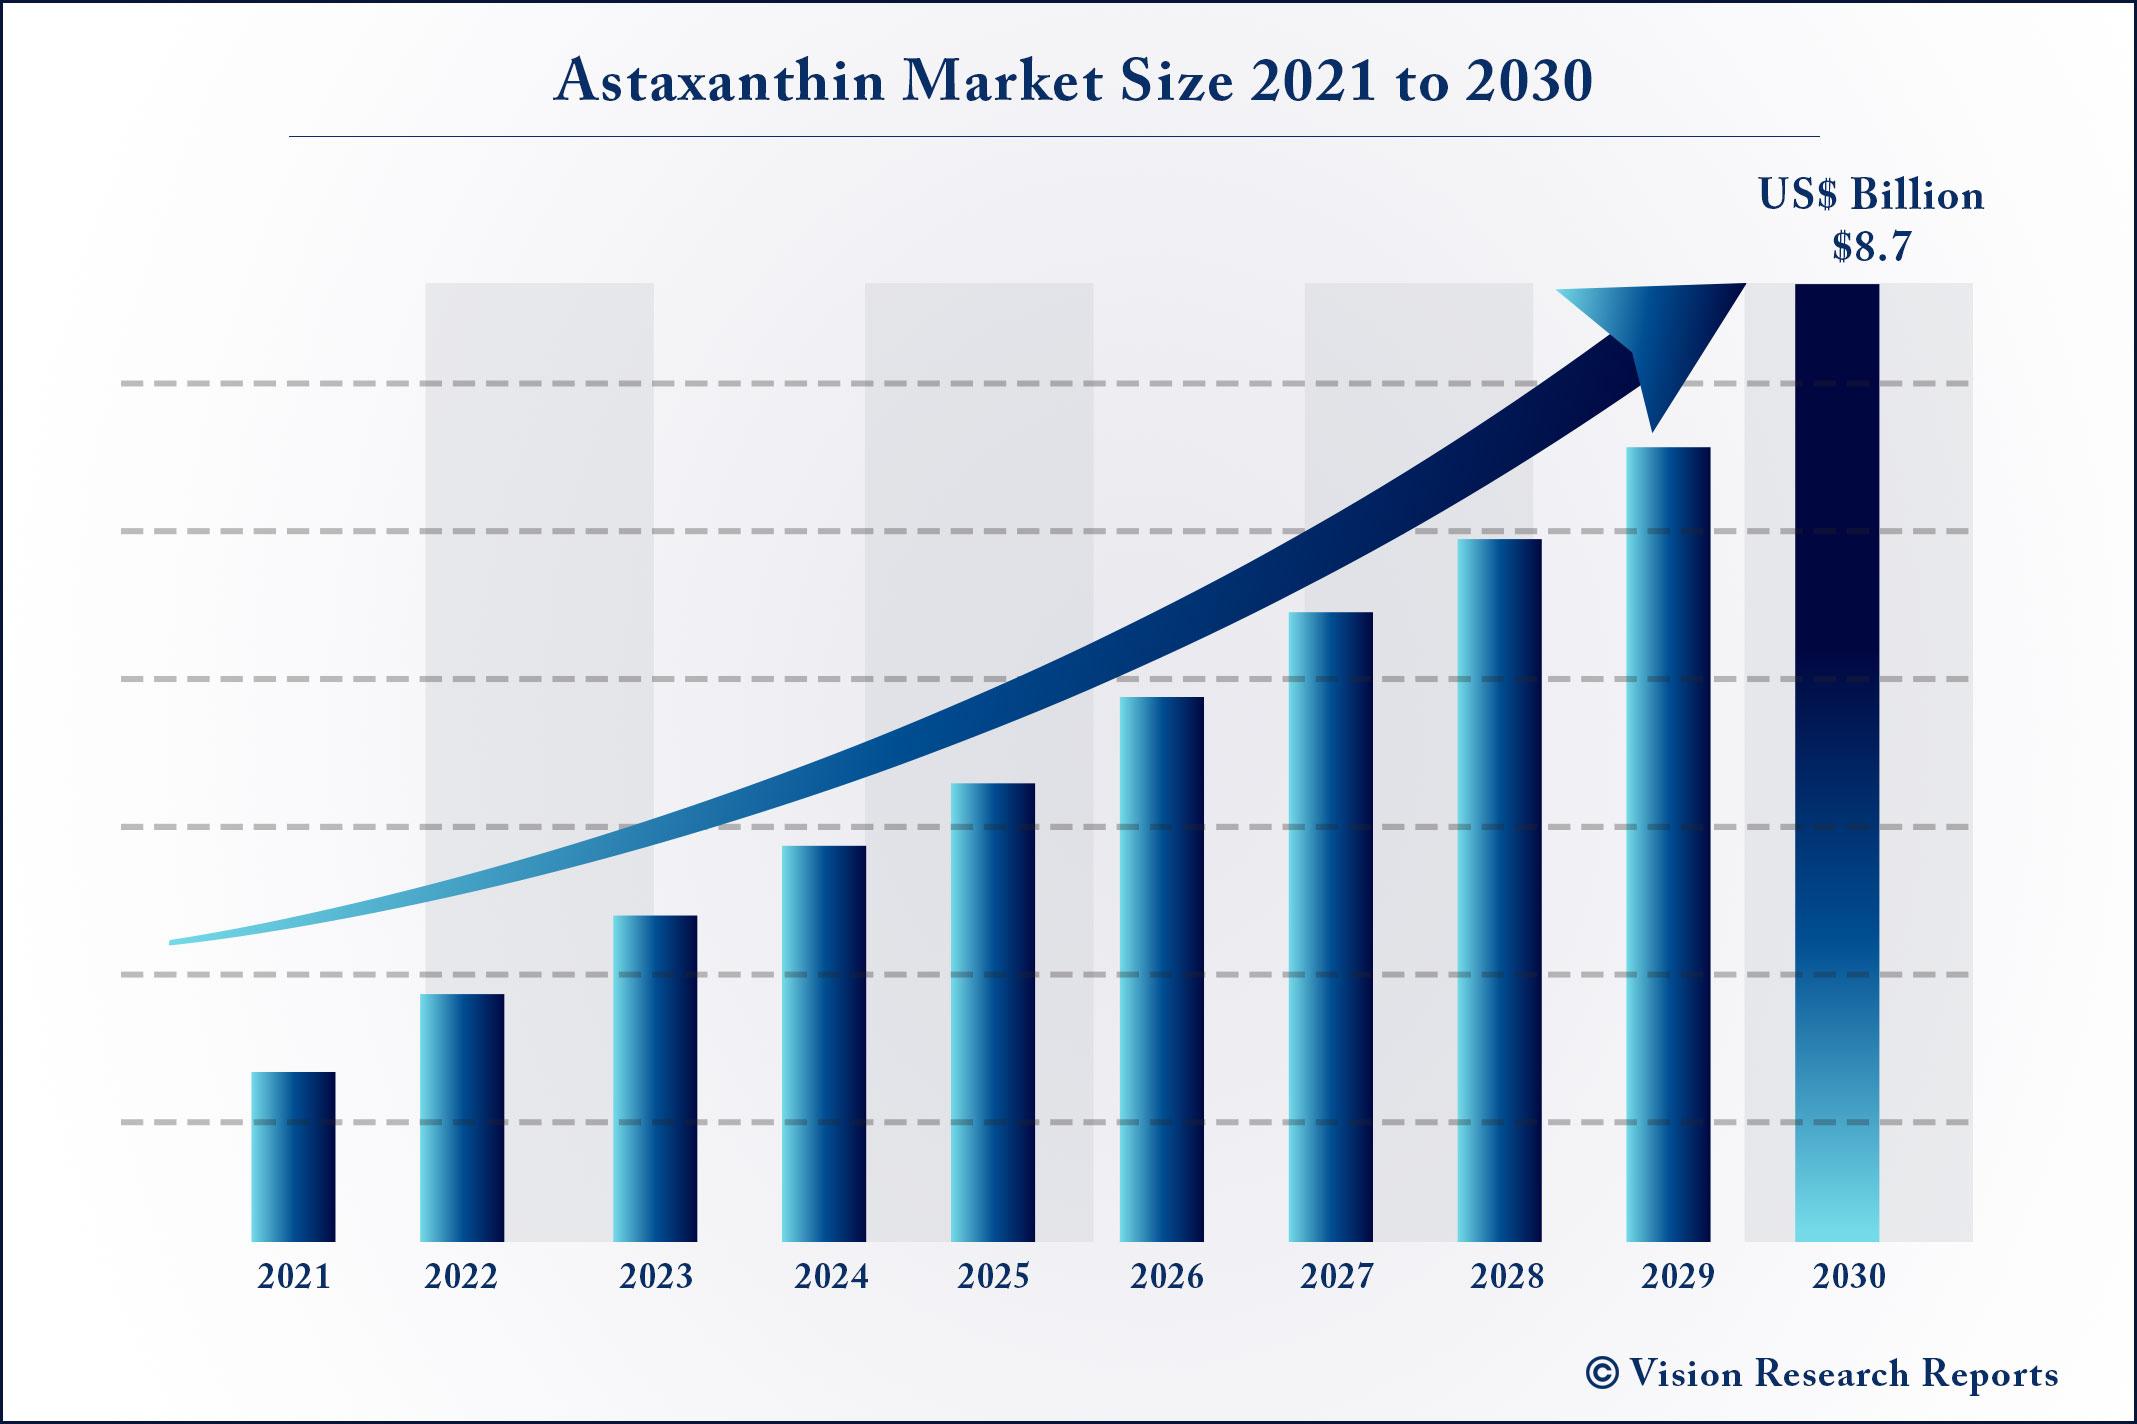 Astaxanthin Market Size 2021 to 2030